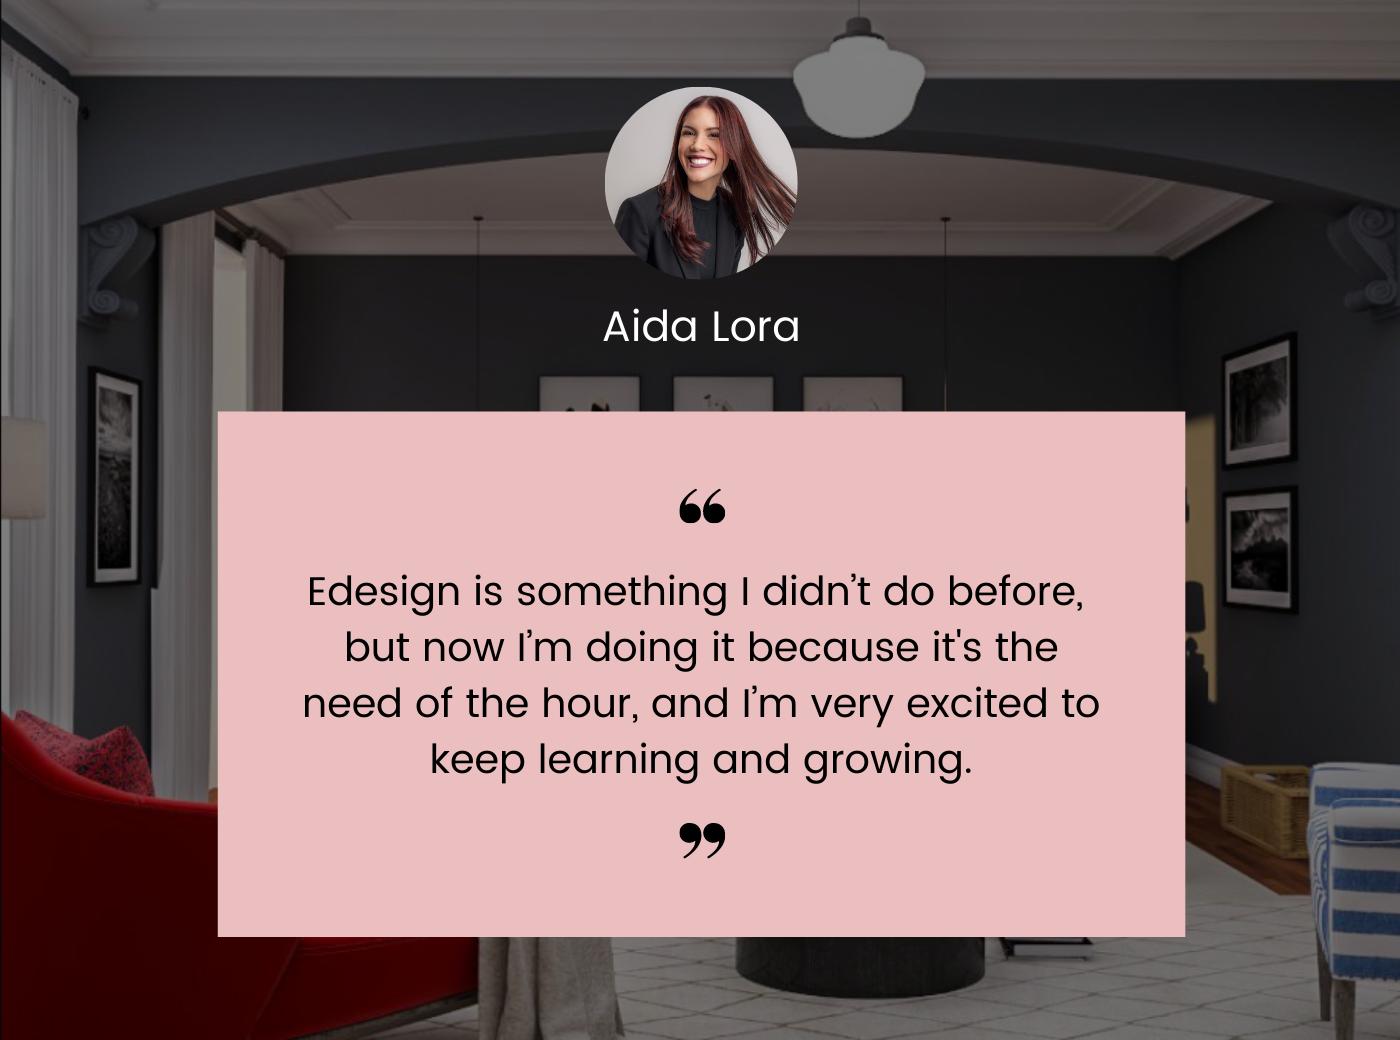 Why E-design - Aida Lora